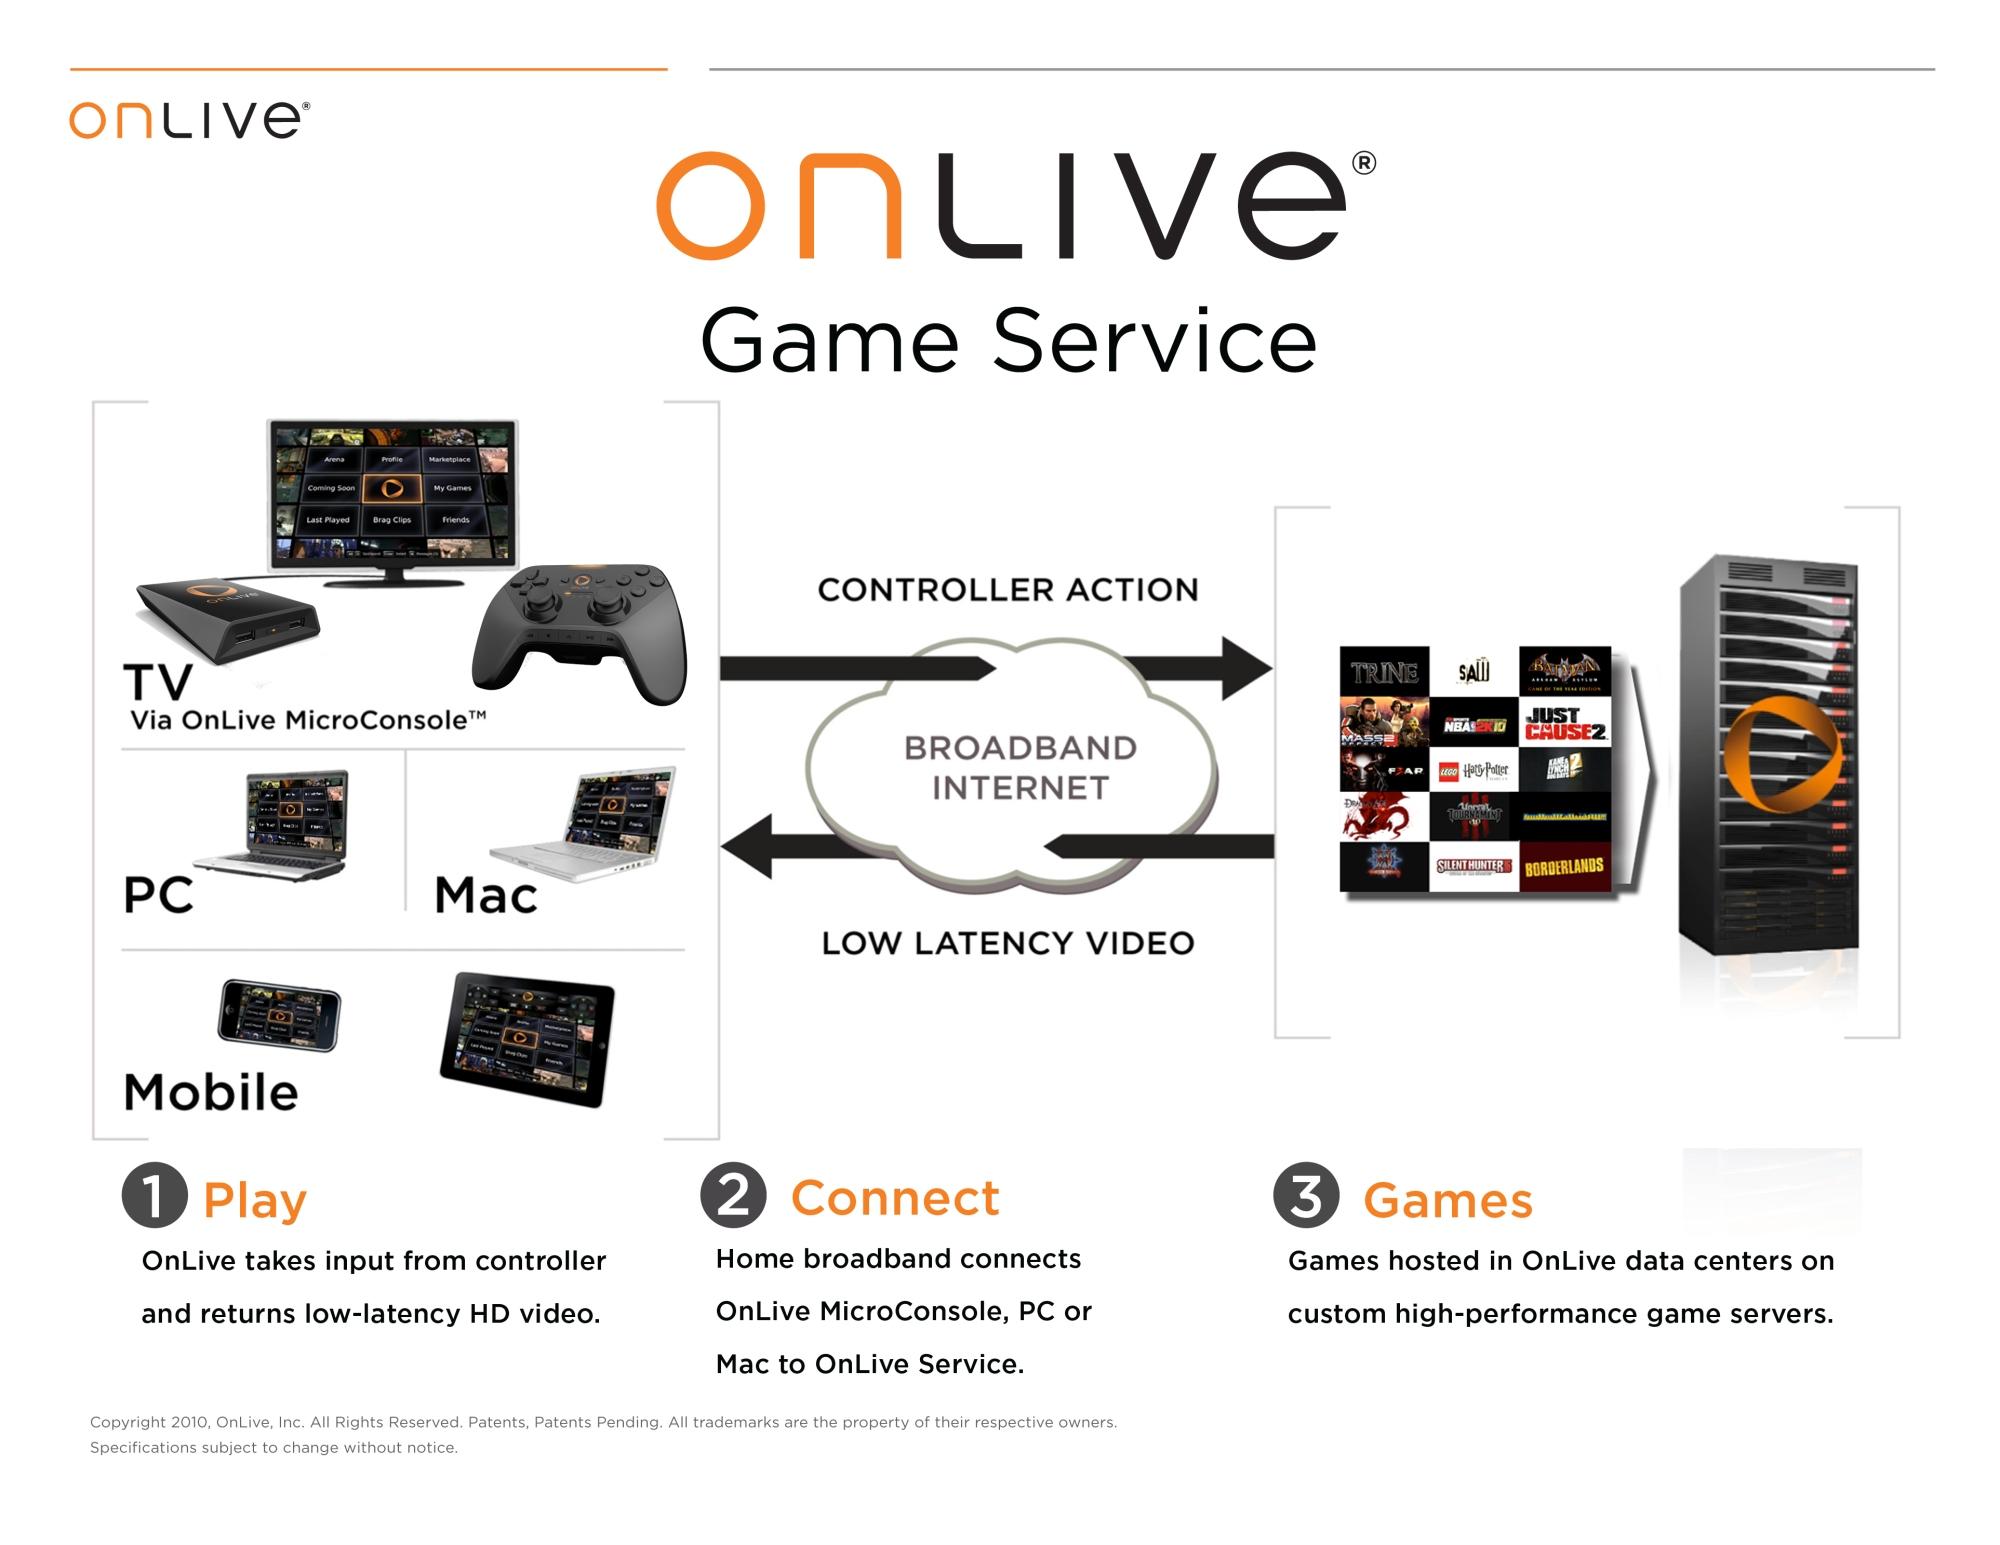 OnLive Game Service